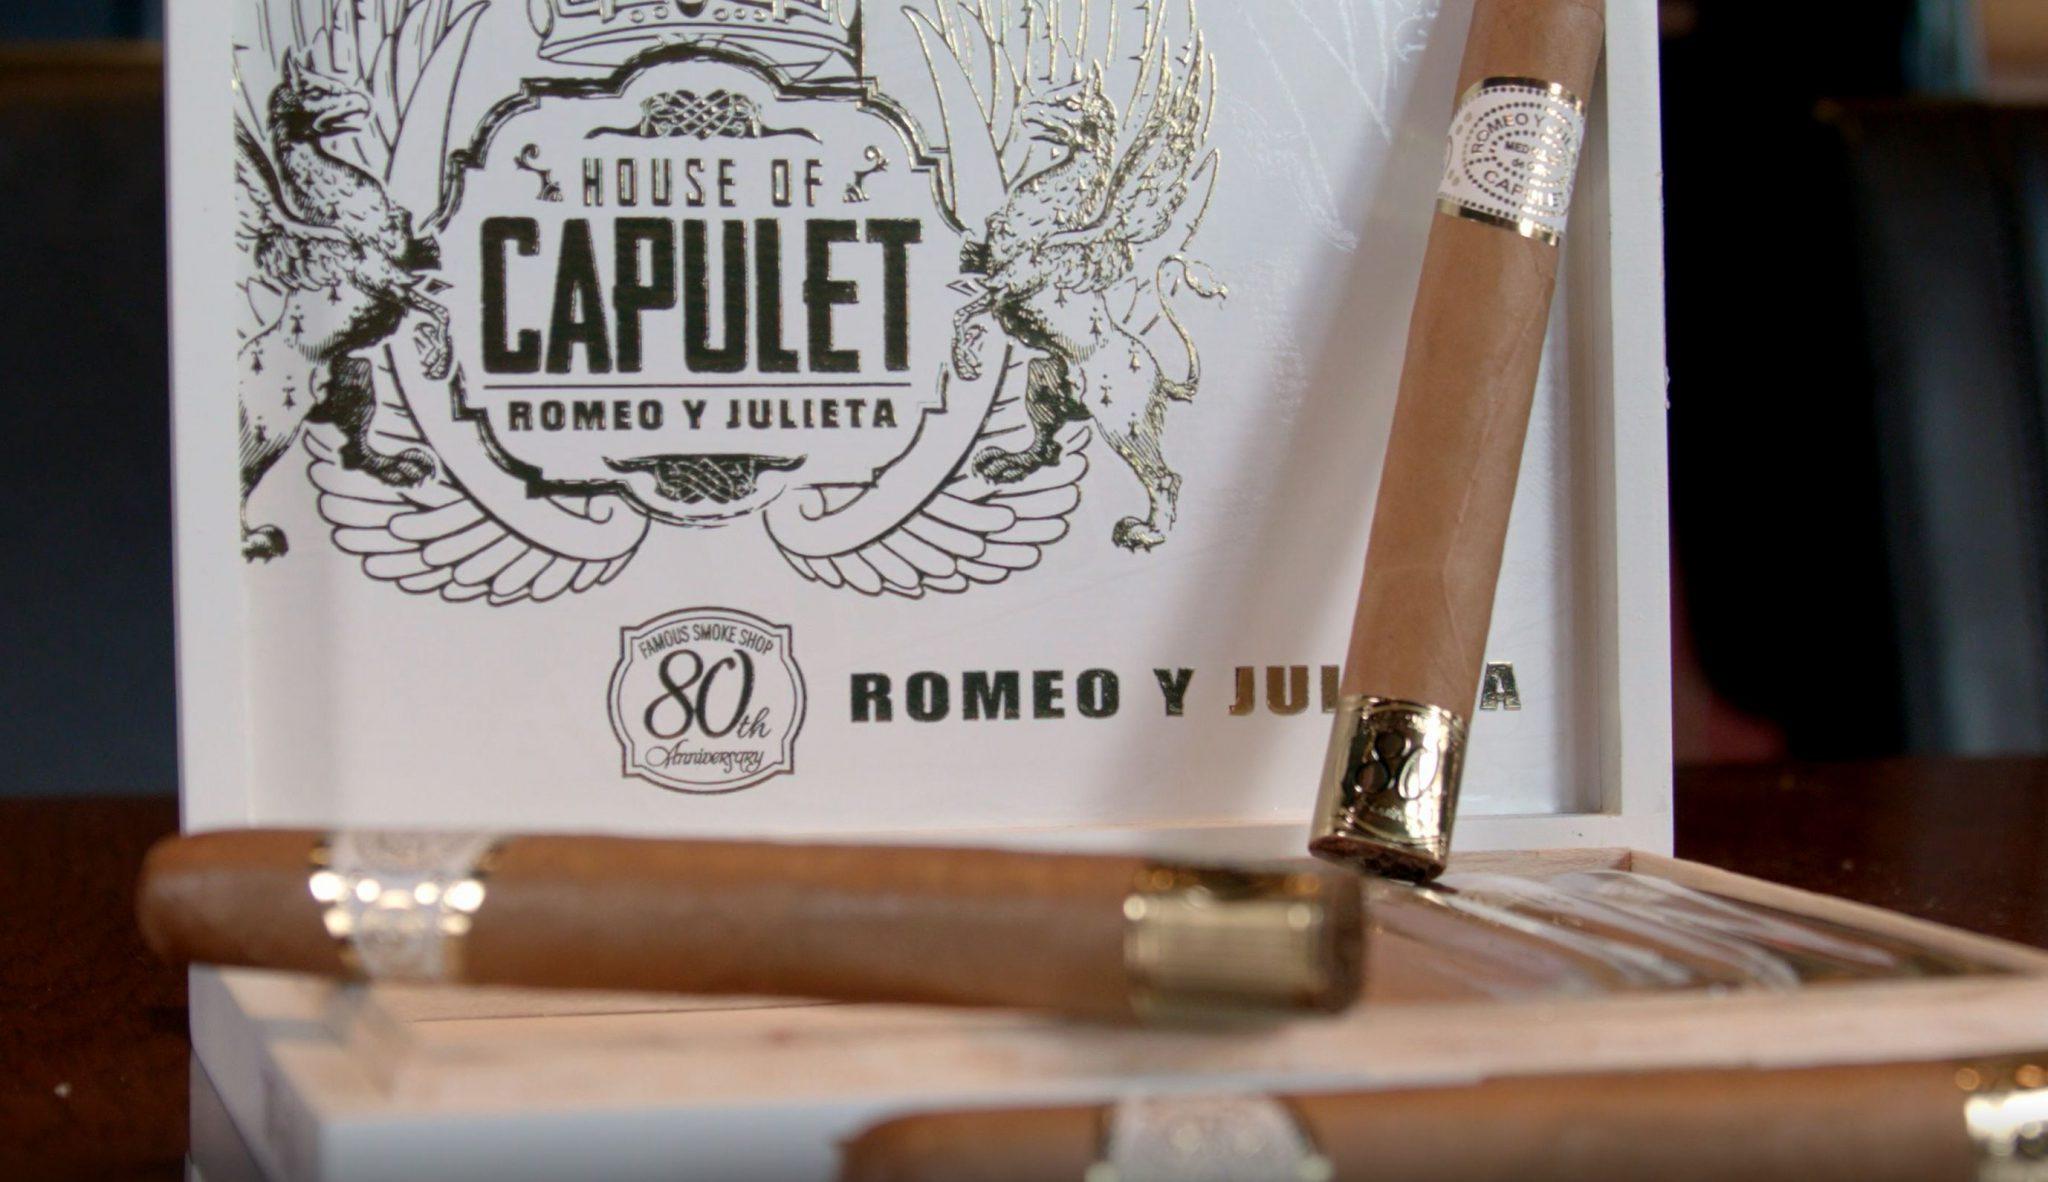 Romeo y Julieta House of Capulet 80th Anniversary cigar review video Toro cigar inside of cigar box vista